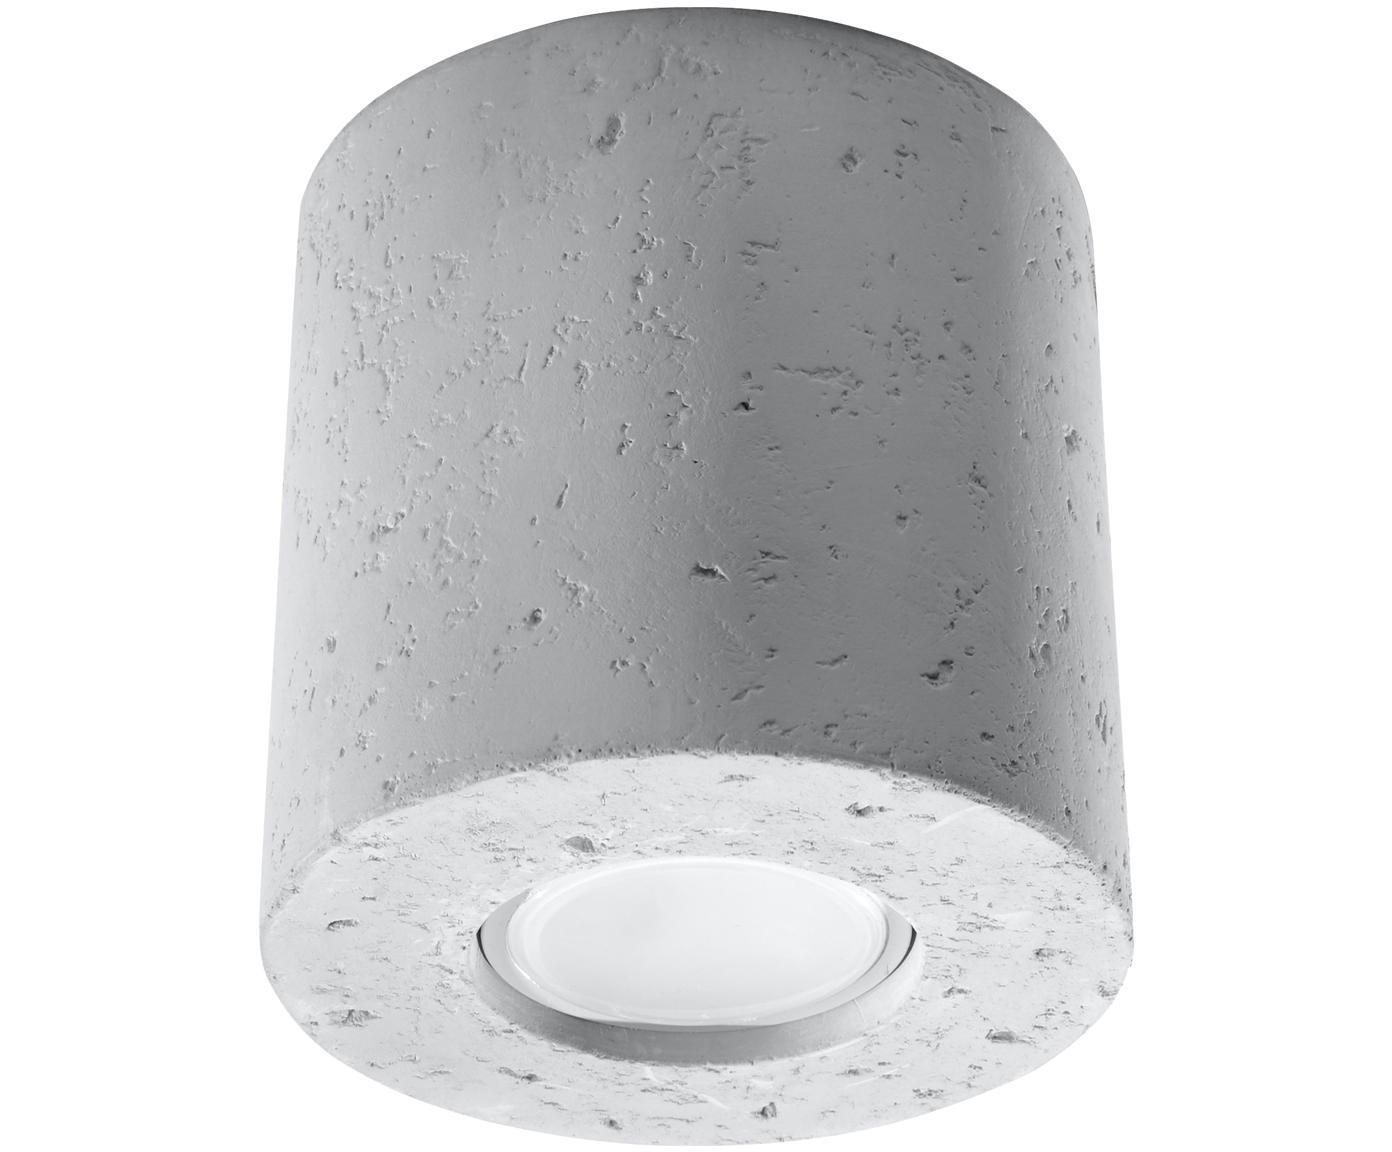 Deckenspot Roda aus Beton, Beton, Hellgrau, Ø 10 x H 10 cm